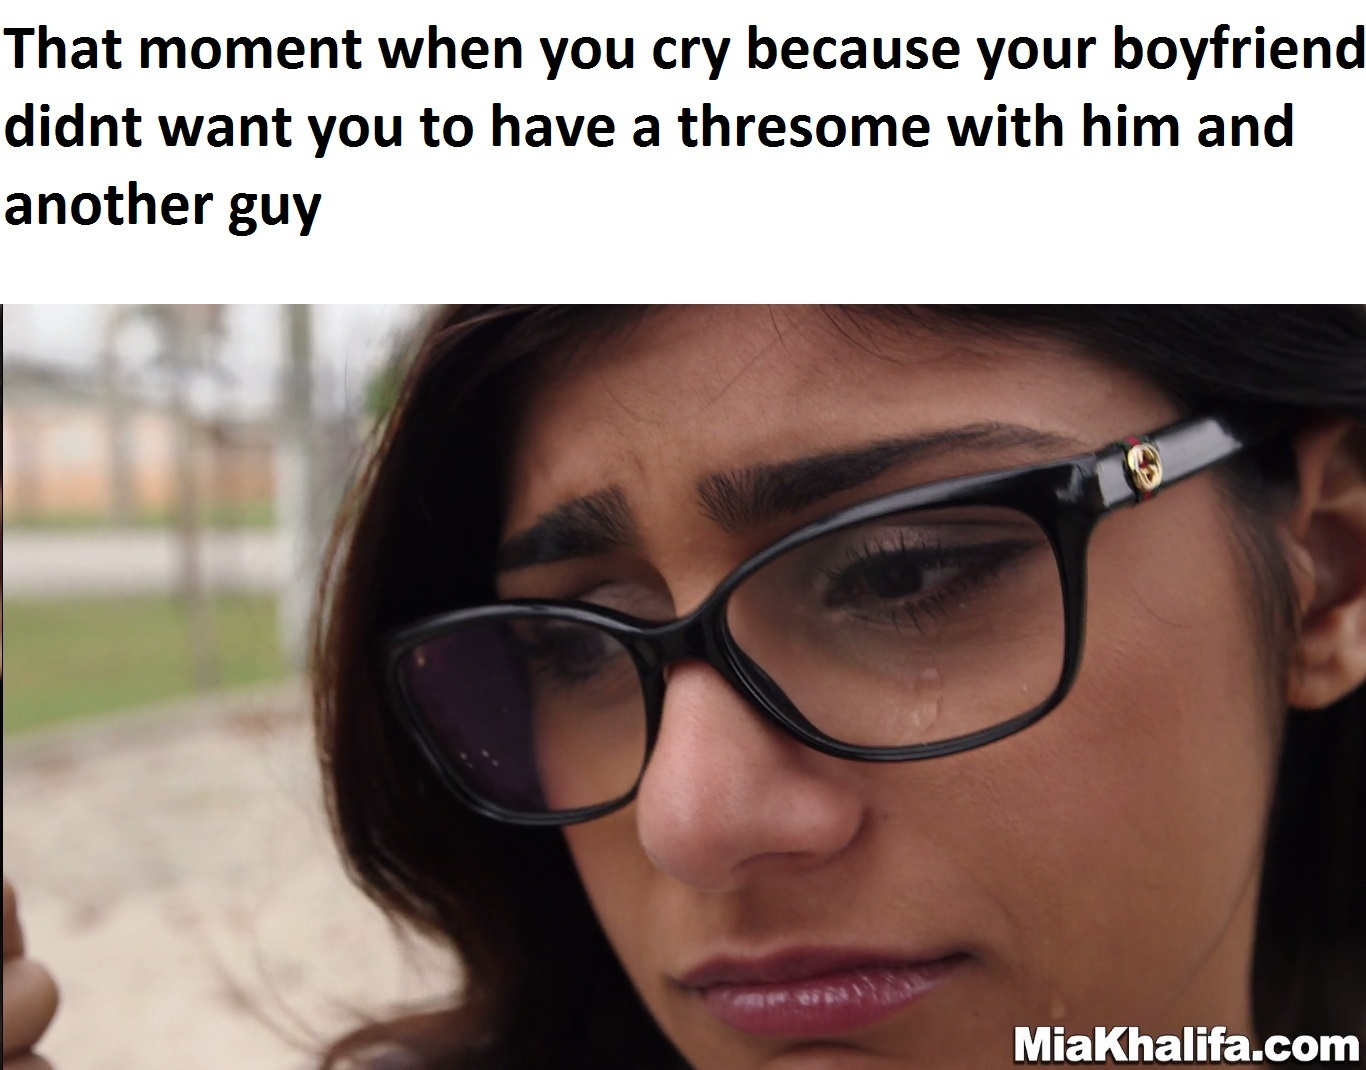 Mia Khalifa Memes